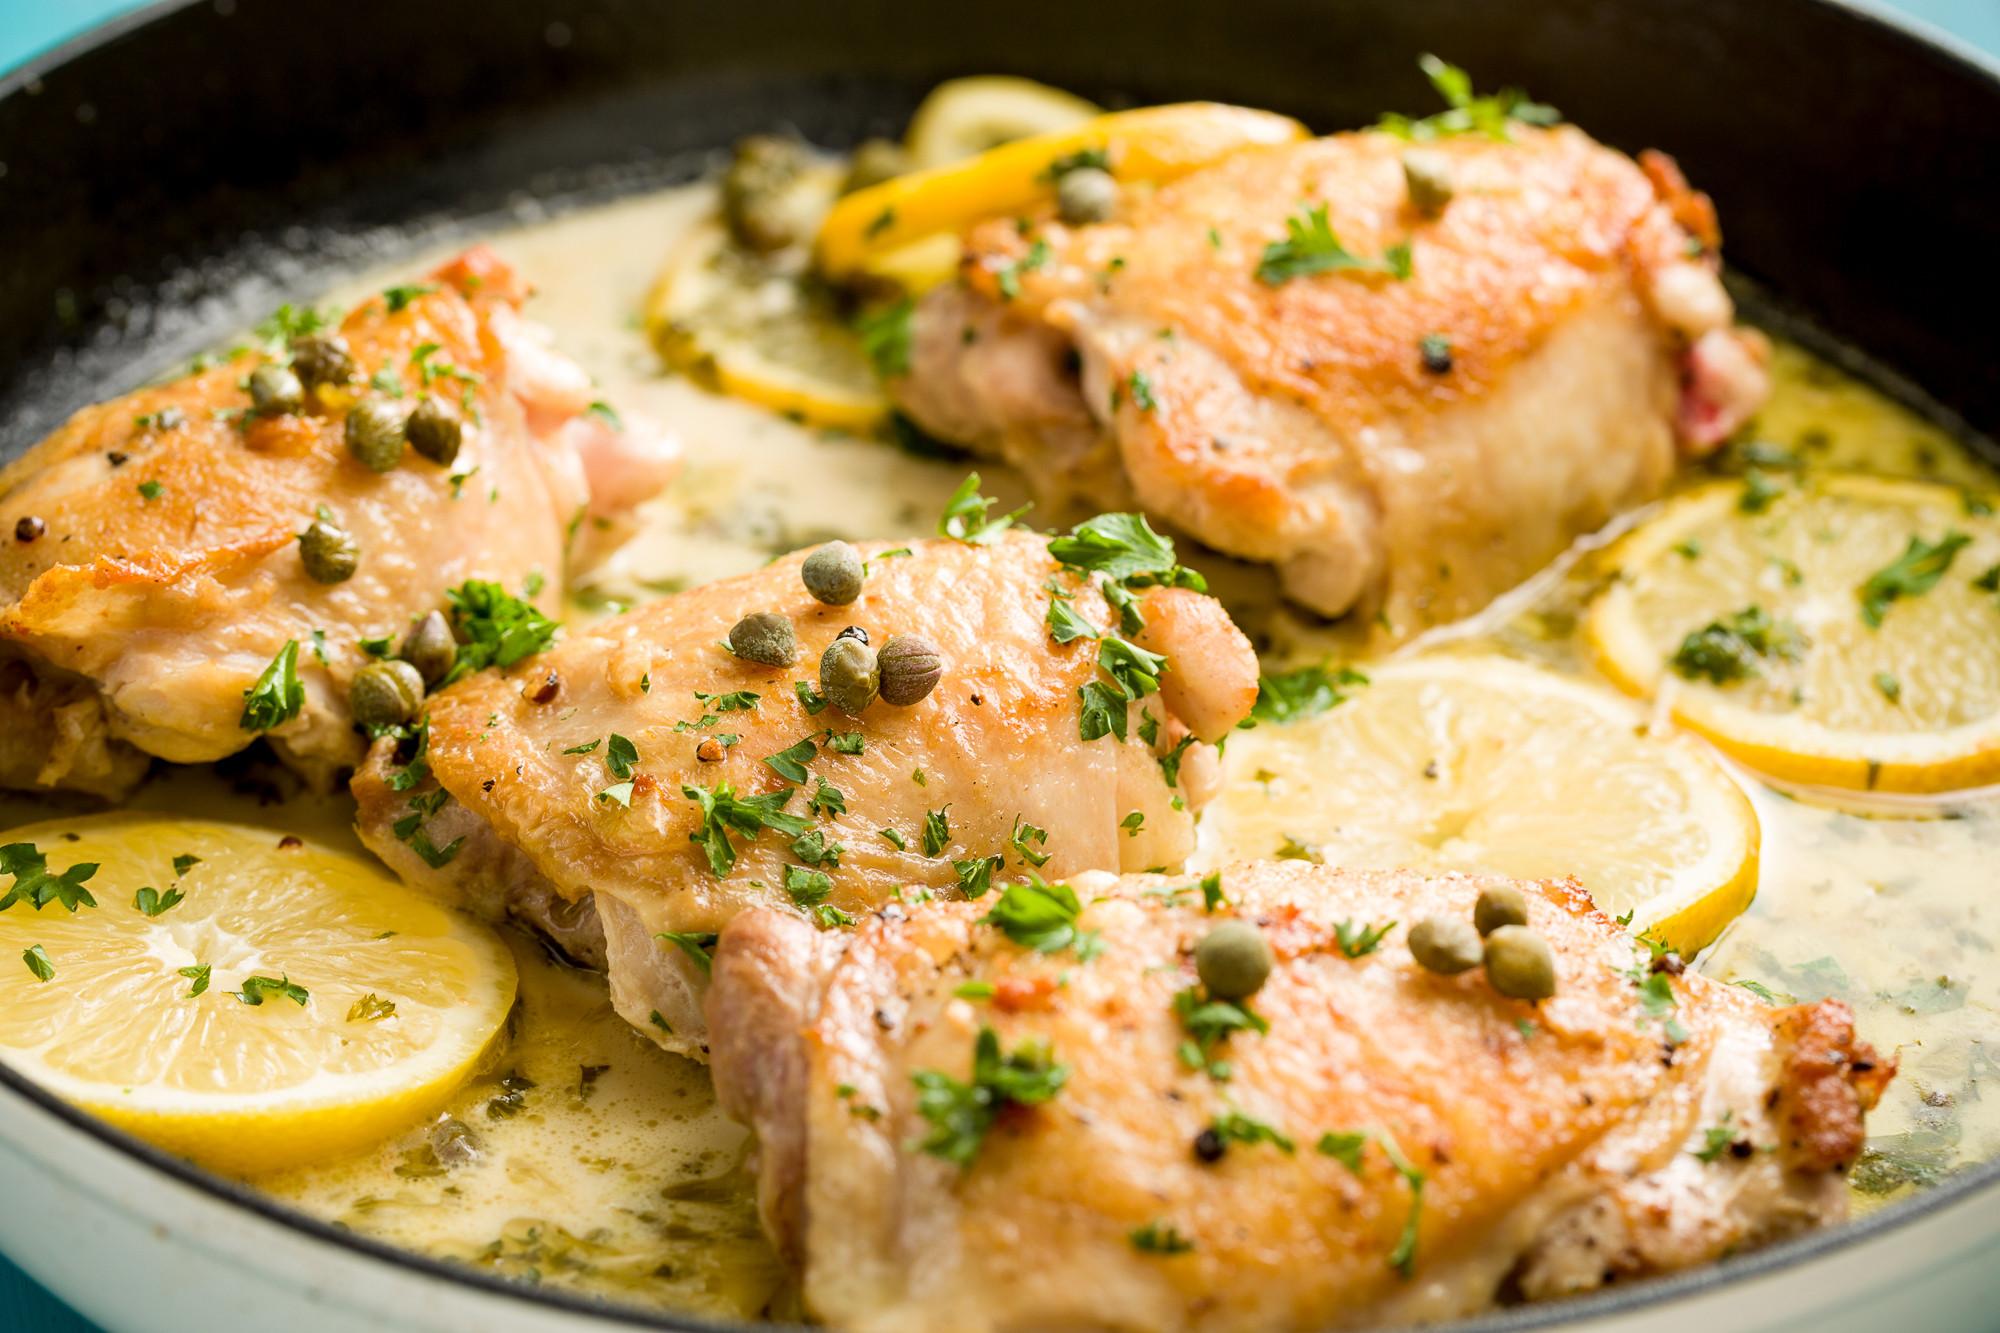 Chicken Dinner Recipes  18 Easy Lemon Chicken Recipes How to Make Lemon Chicken